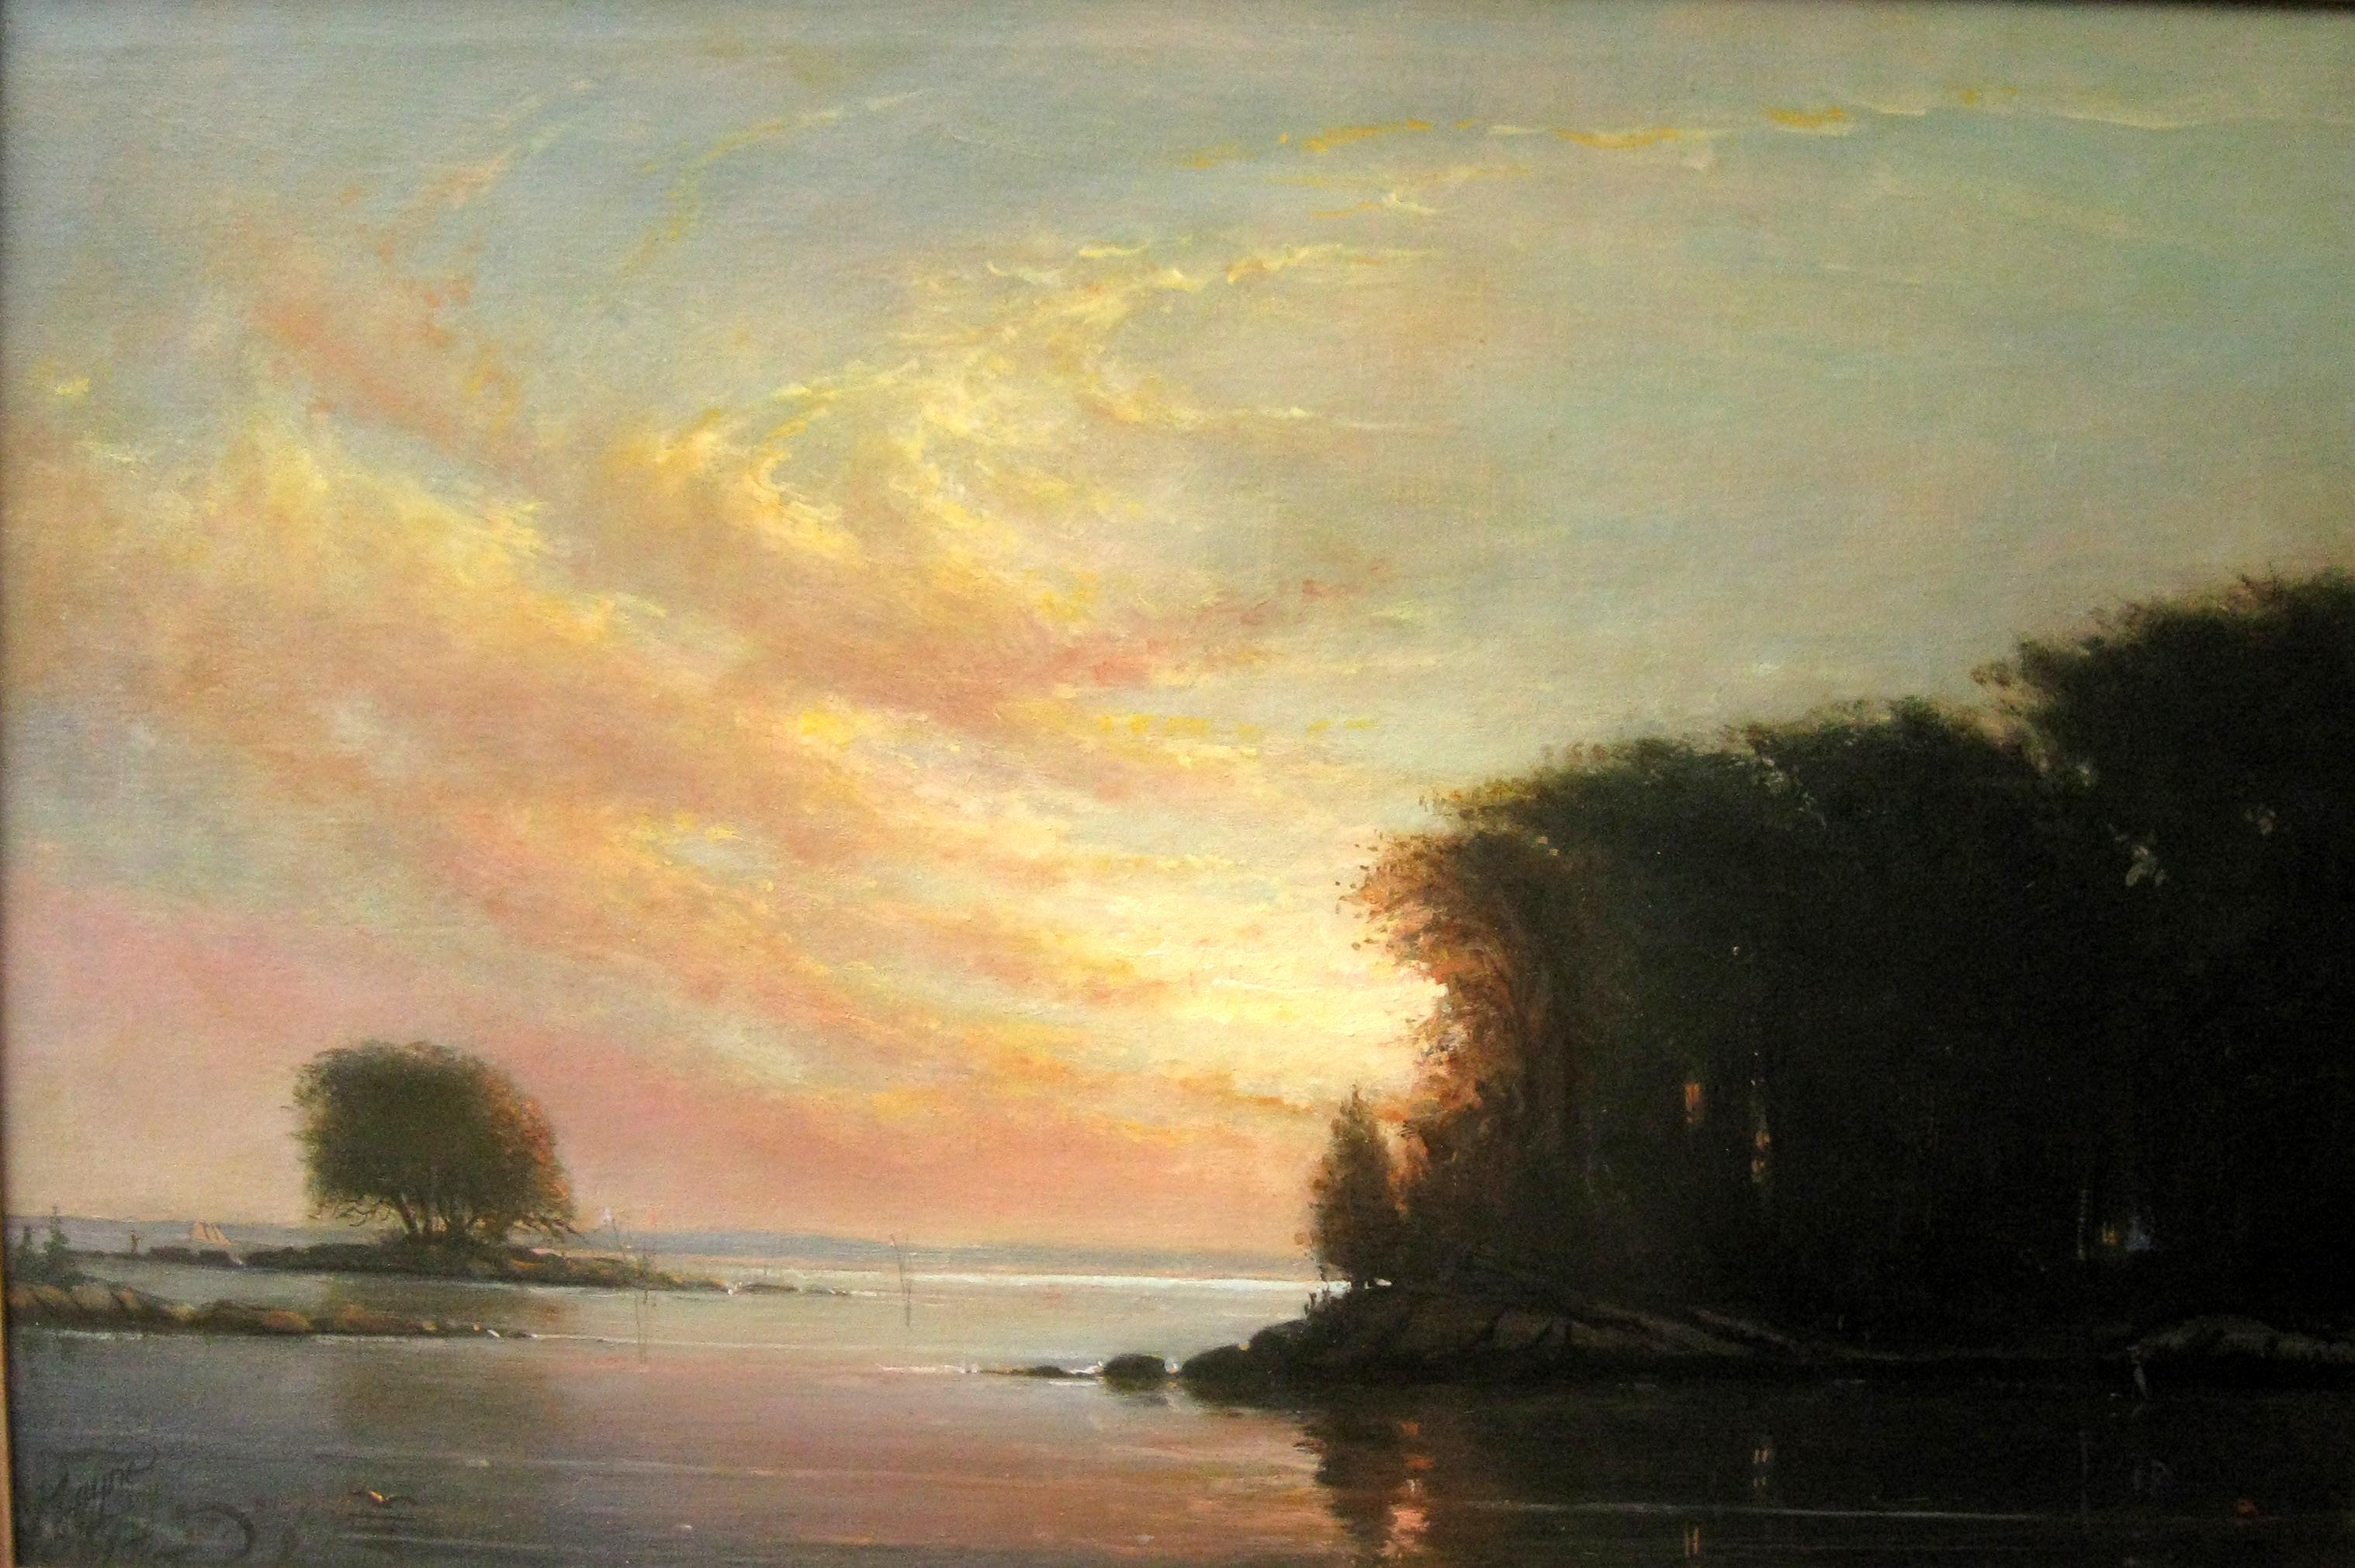 Fish Island Sunset, Darien - 24x36